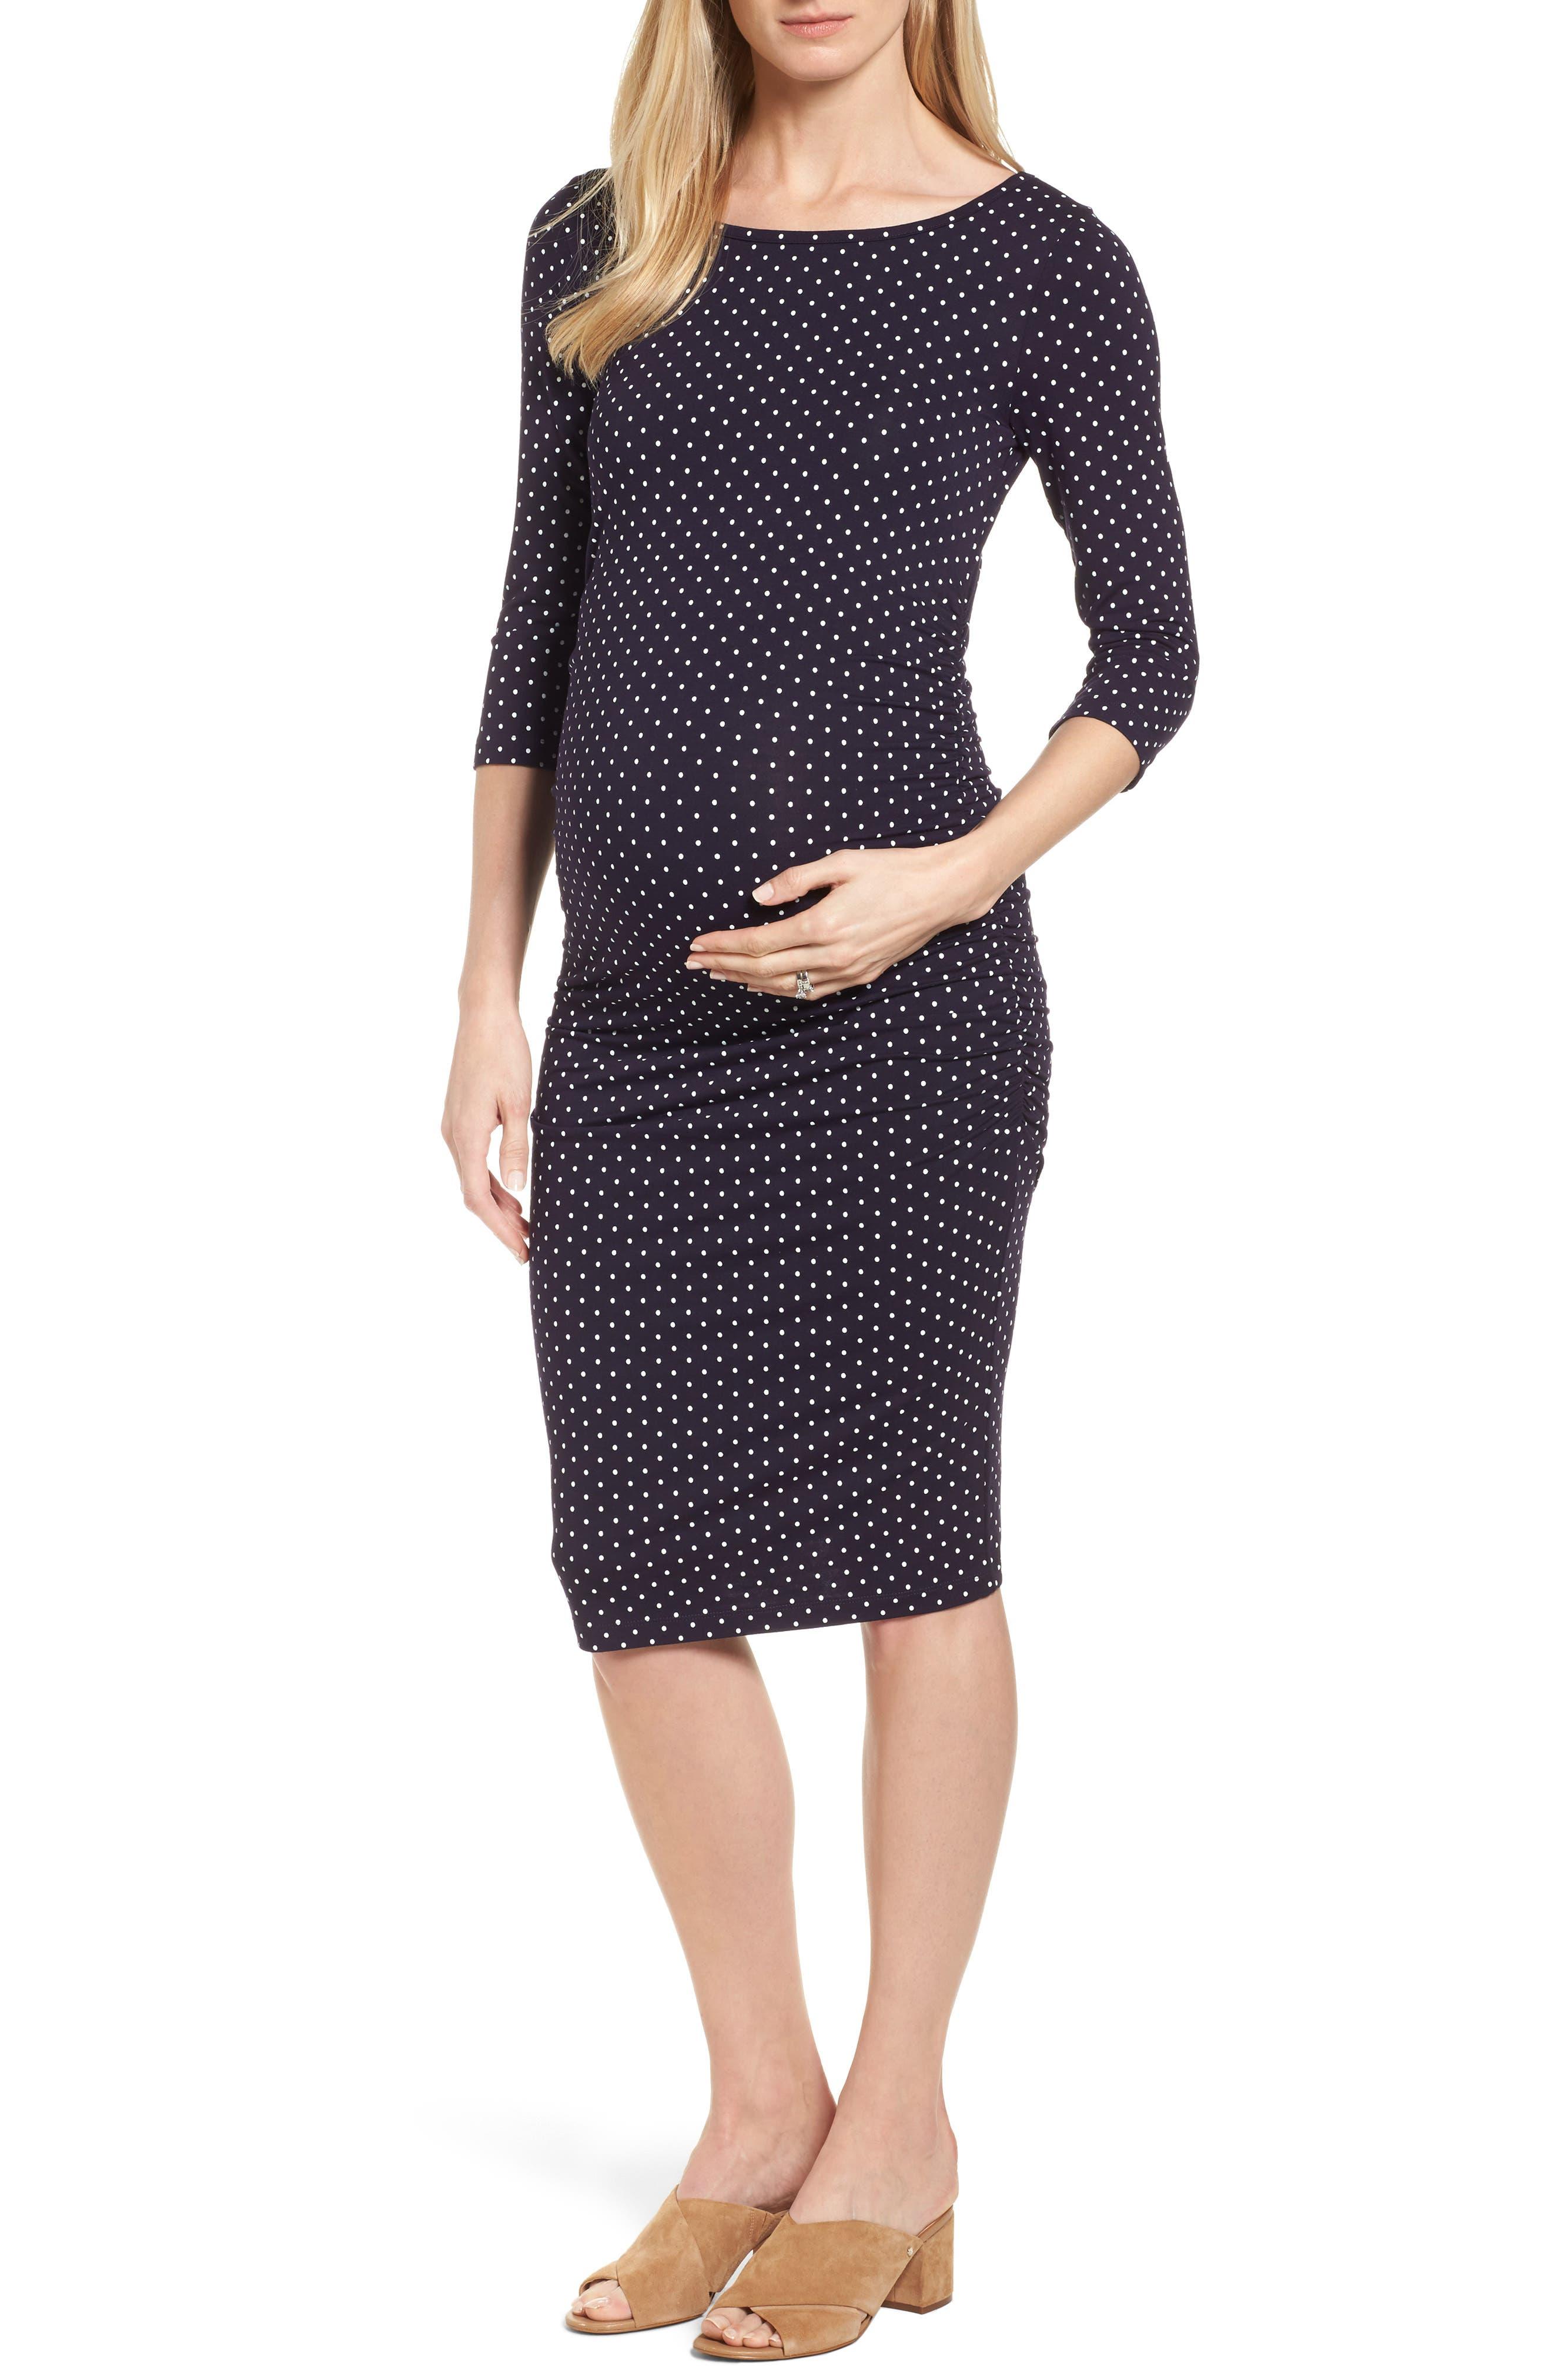 Main Image - Isabella Oliver Jennifer Dot Ruched Maternity Dress